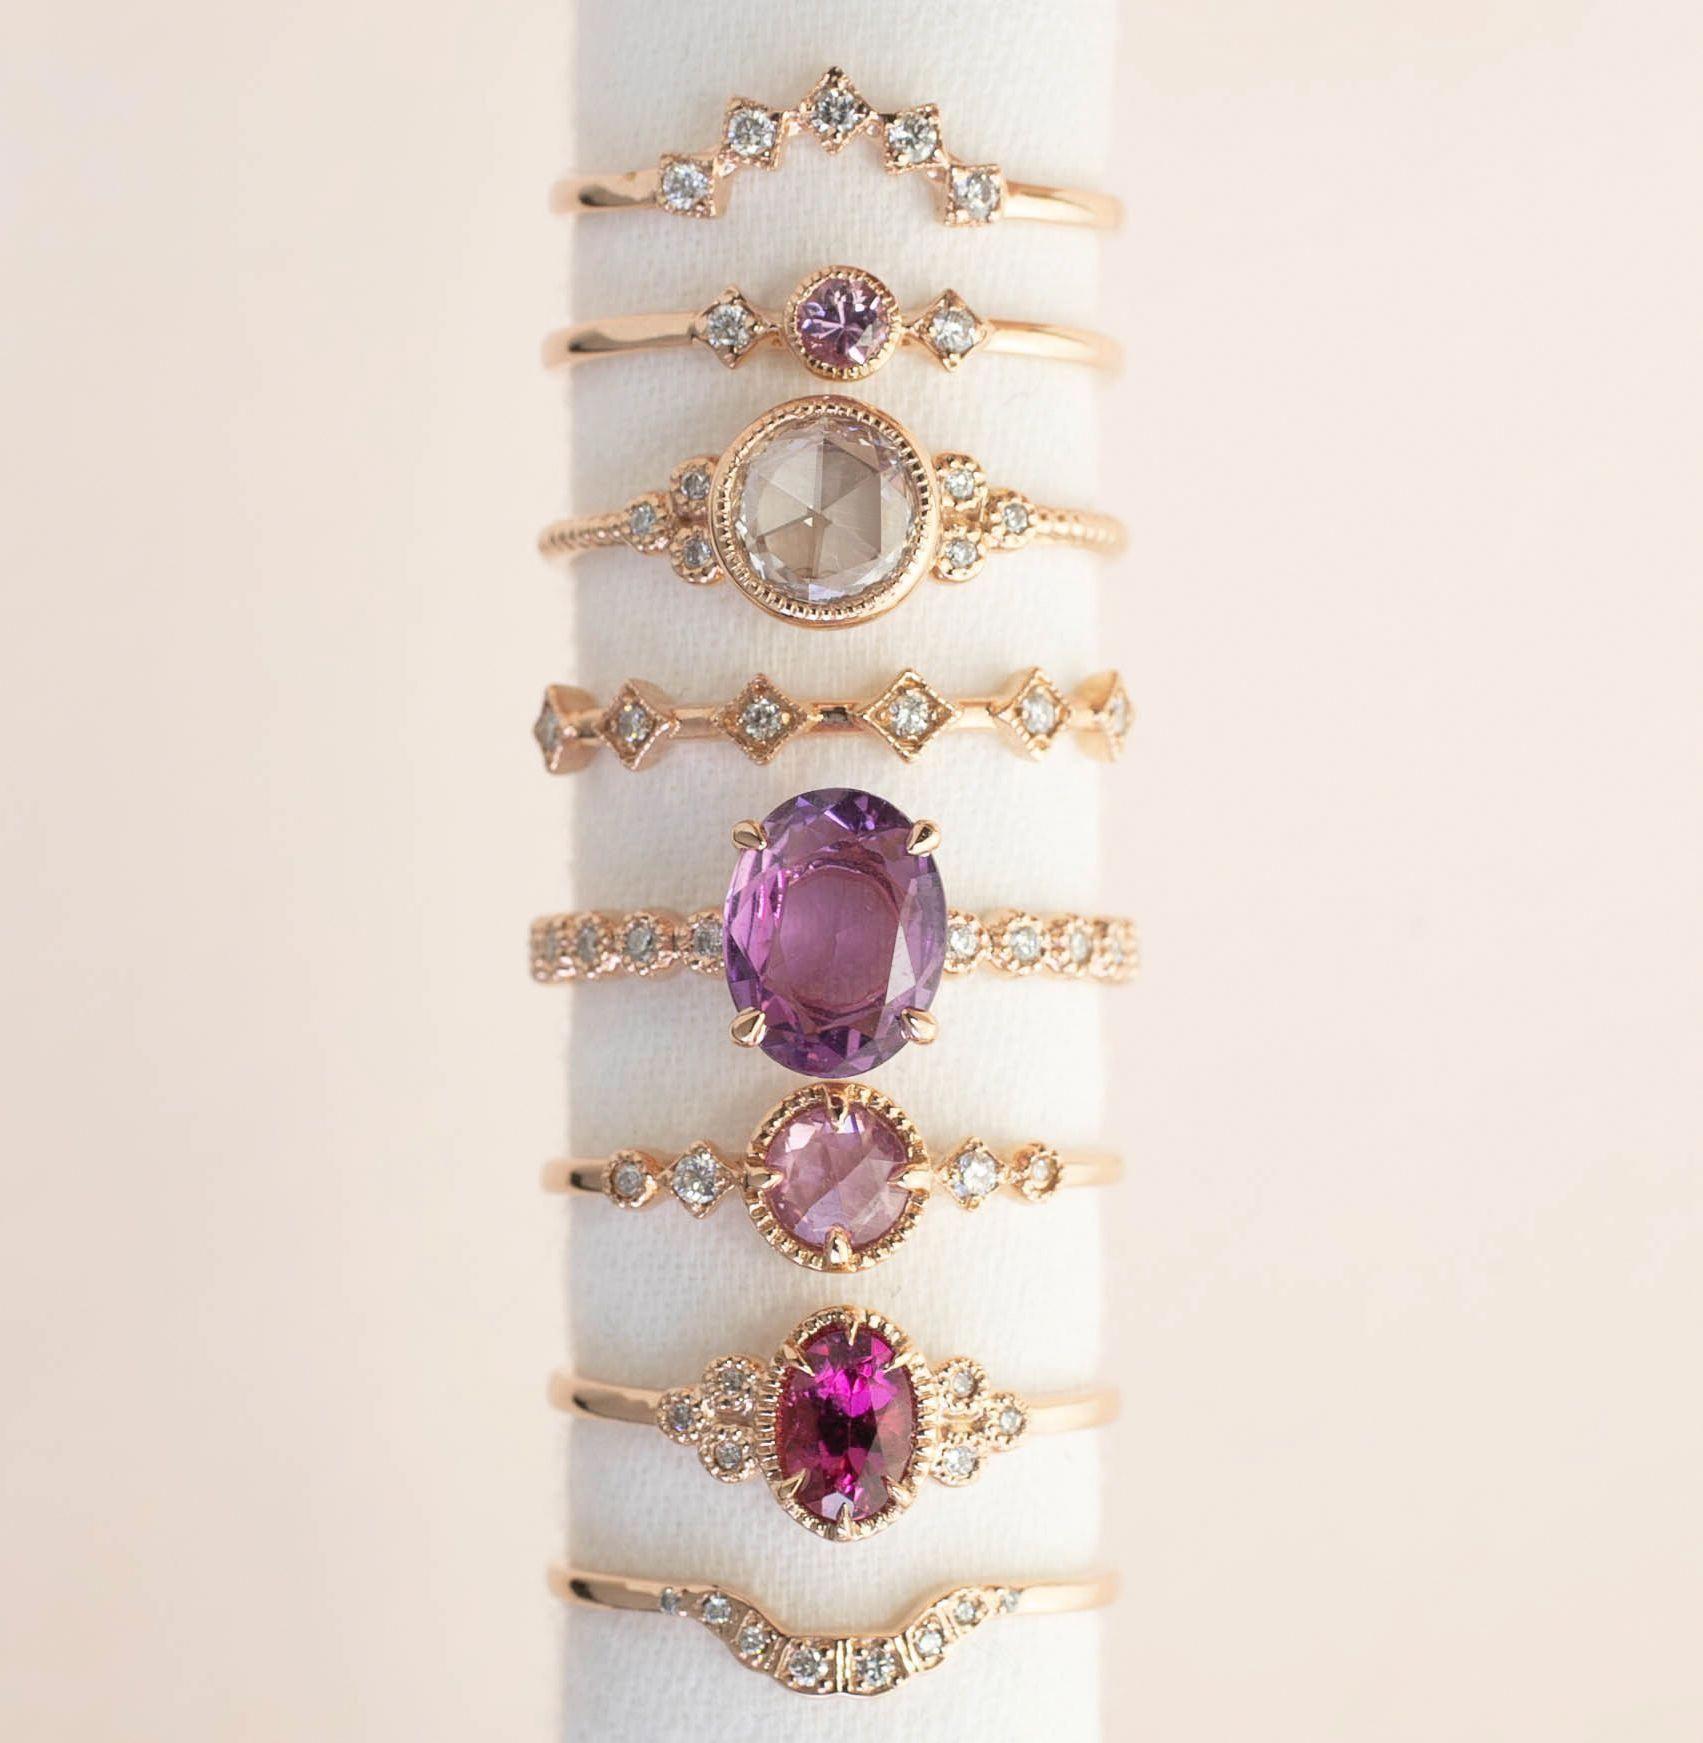 Blue Sapphire Engagement Ring Set 14K Yellow Gold Rings Unique Sapphire Engagement Branch Ring Set - Fine Jewelry Ideas -   - #14K #Blue #branch #Bridesmaidjewelry #Electroformedjewelry #engagement #FINE #finejewelry #Gold #ideas #Jewelry #Ring #rings #sapphire #Set #unique #yellow